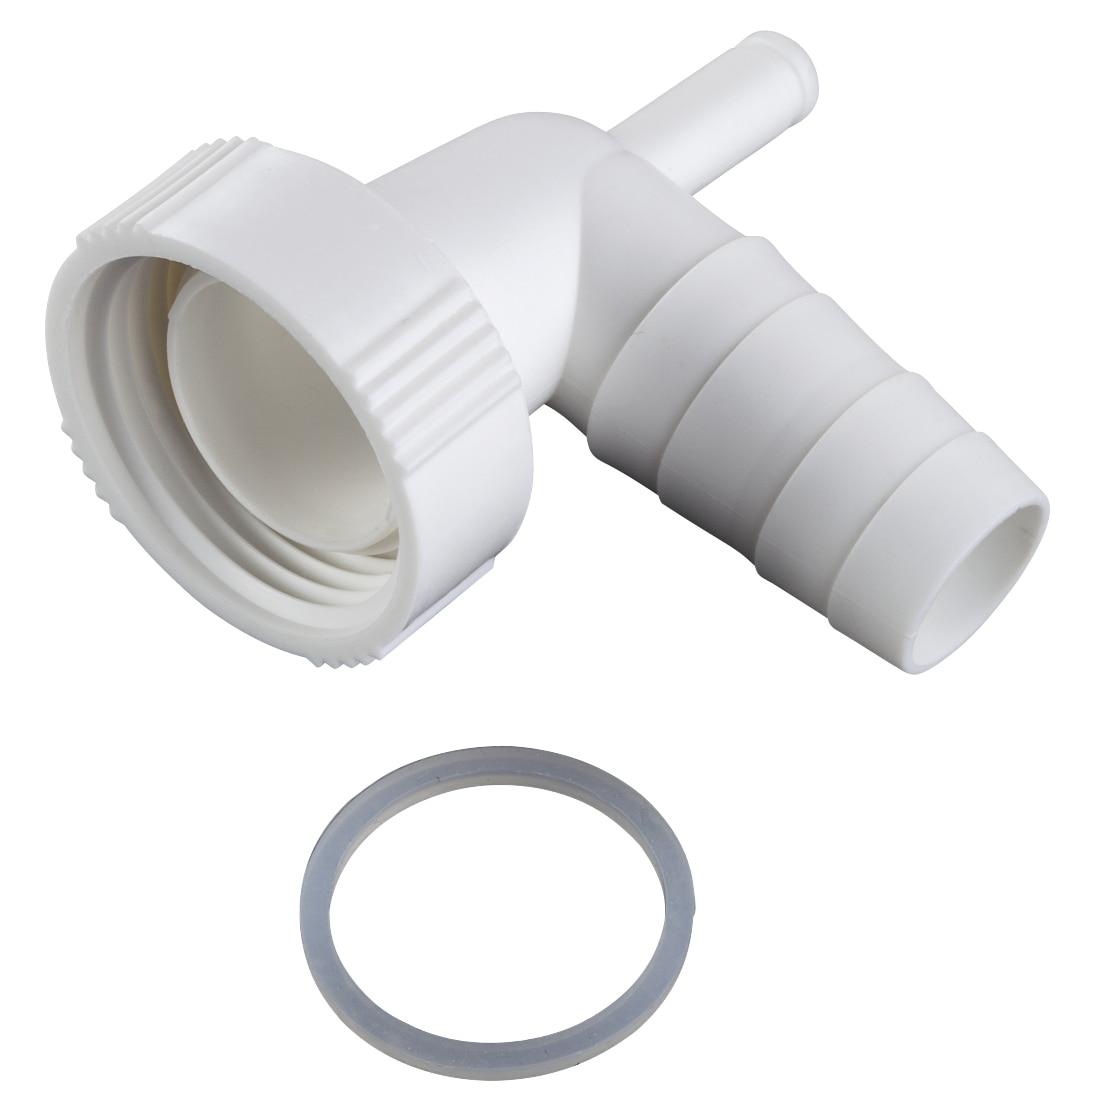 Fotografie Adaptor conexiune furtun evacuare Xavax 111893, Compatibil cu masina de spalat rufe si masina de spalat vase, Conectare la un sifon, Imbinare 1 inch,